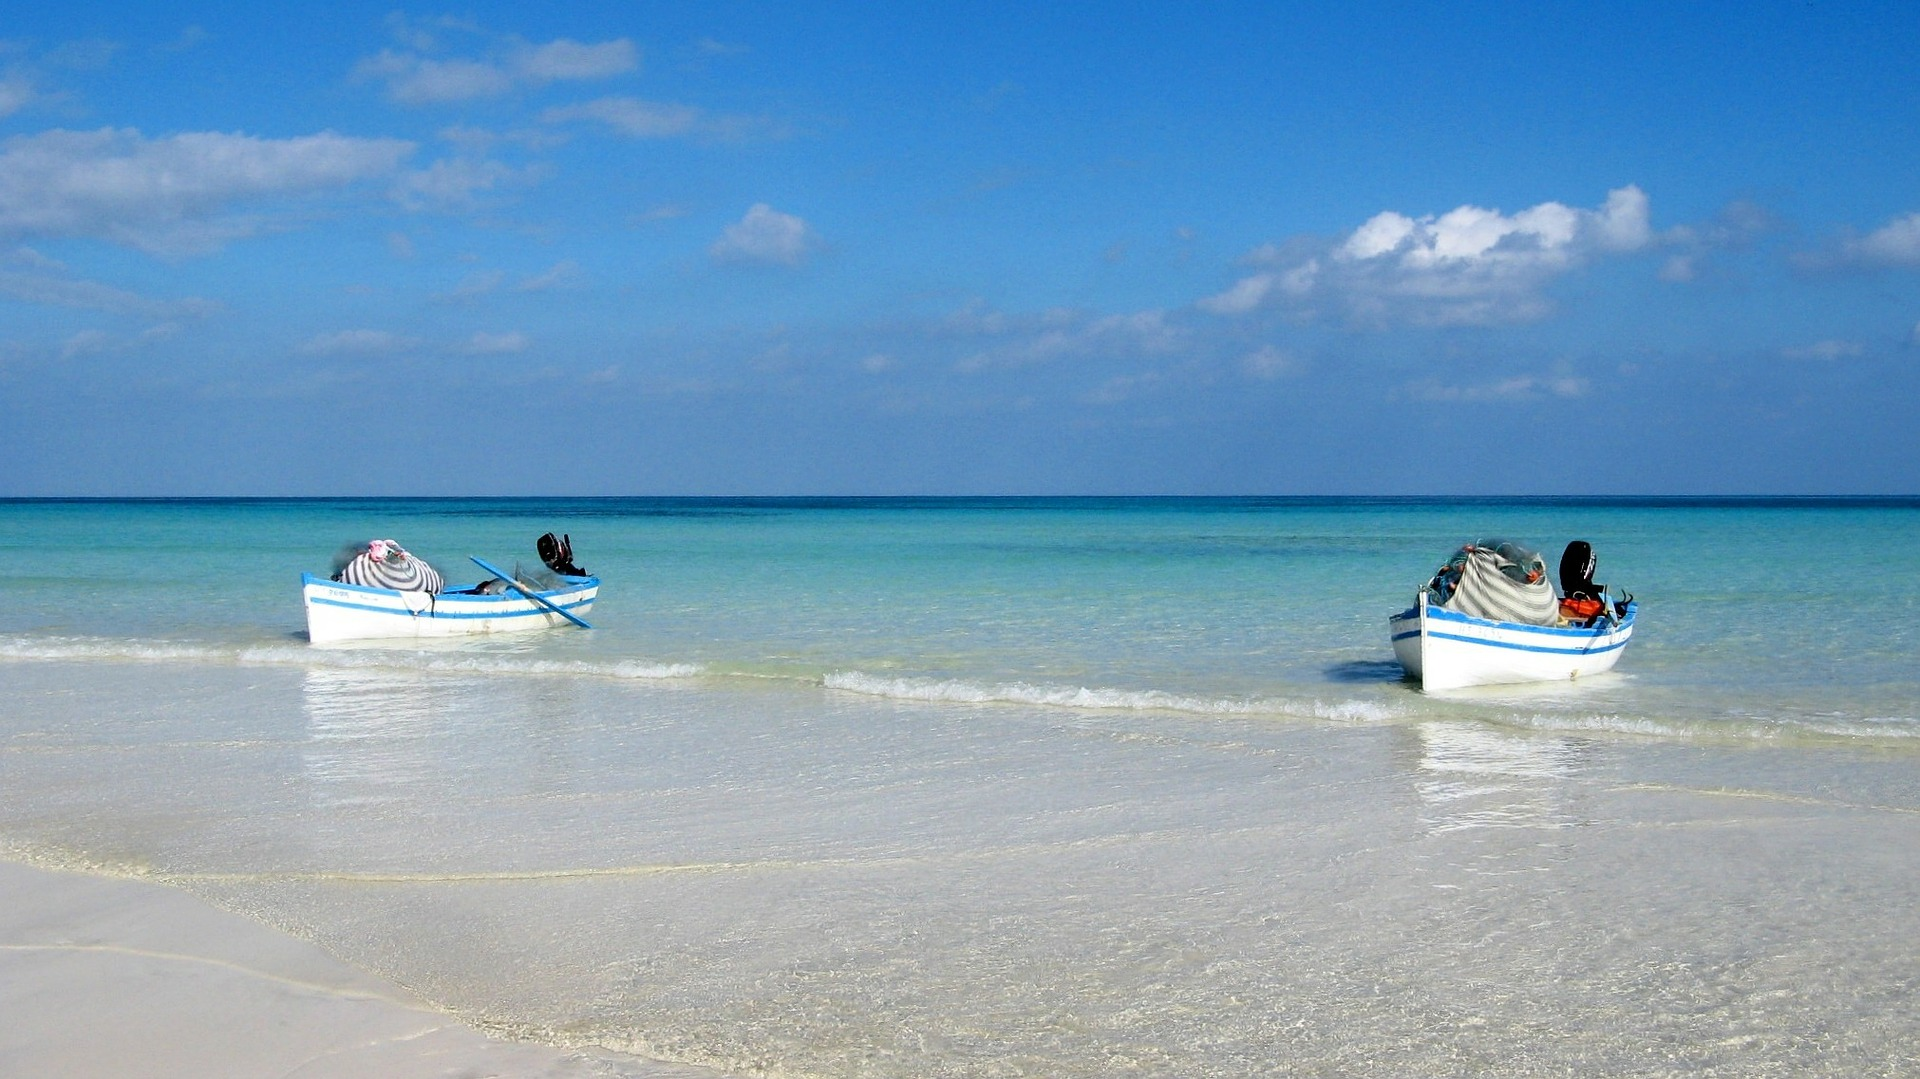 Tunesien All Inclusive Urlaub ab 229,00€ Afrika Deals